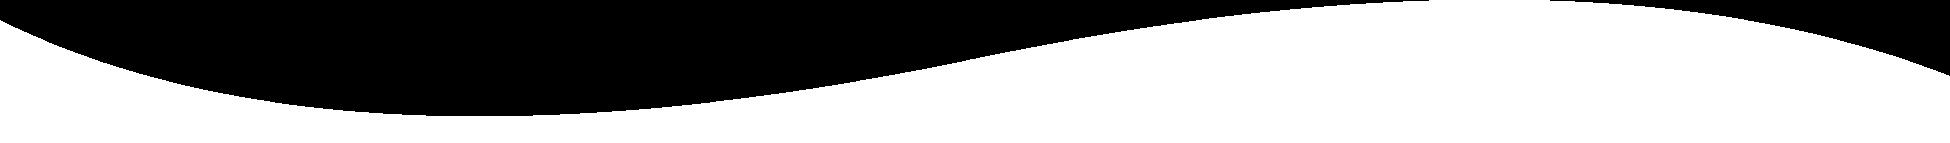 Wavy White Line